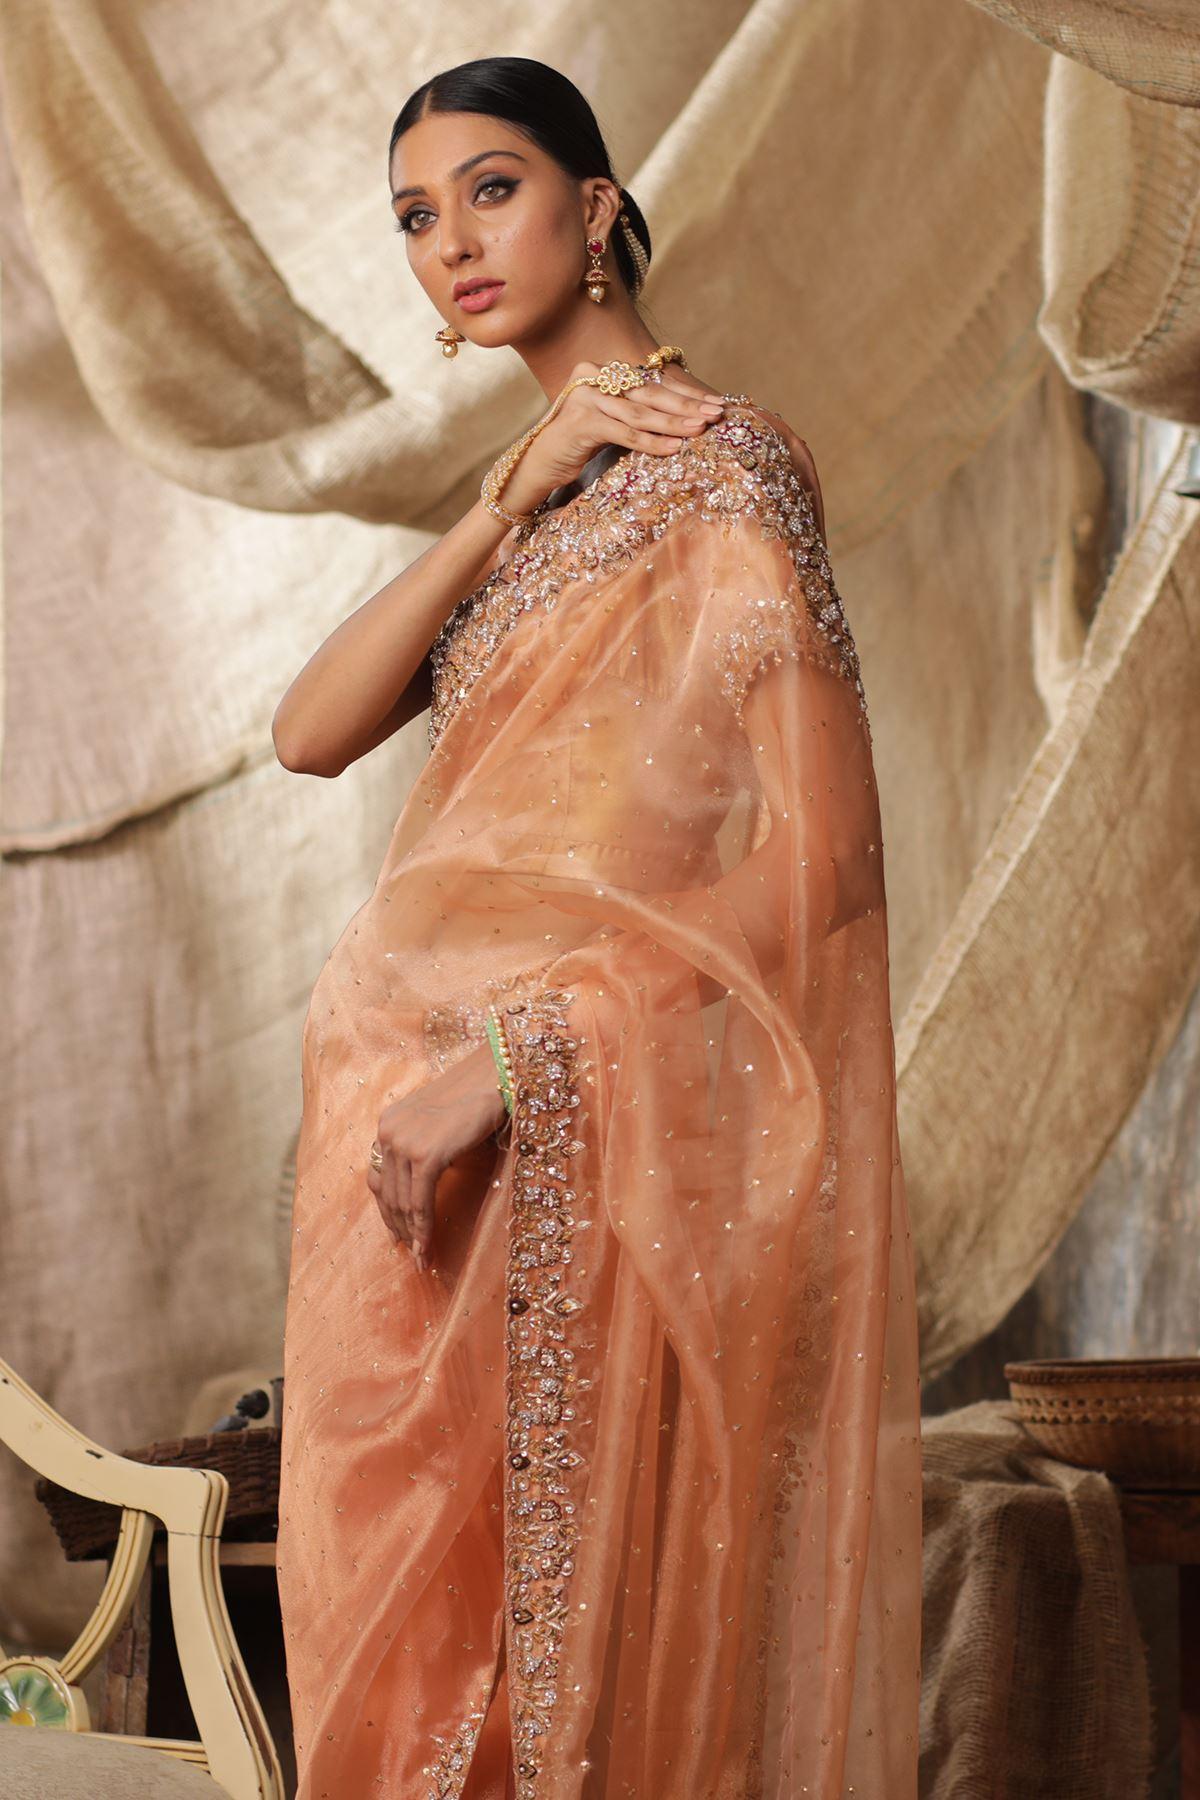 Moazzam Khan Moazzam Khan Party Wear 3Pc Saree Blouse Petti Coat in Peach for Women